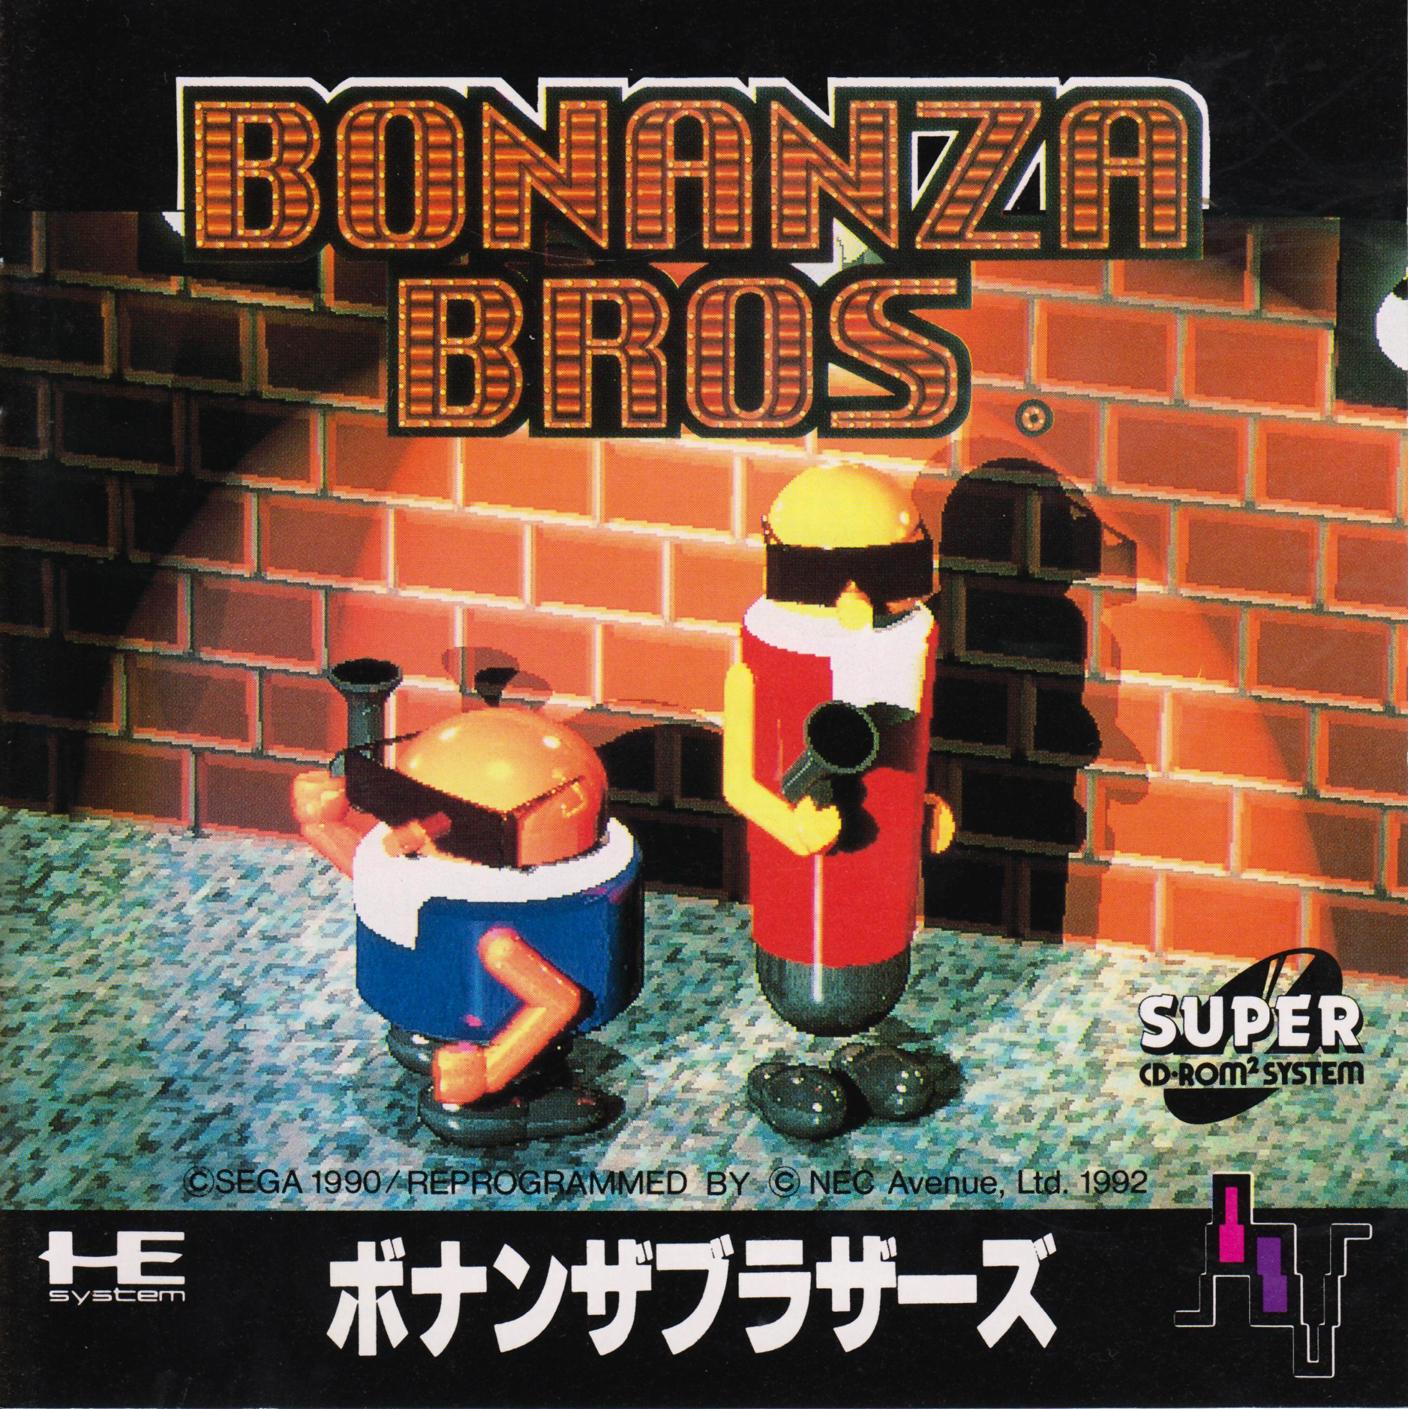 Tgdb Browse Game Bonanza Bros